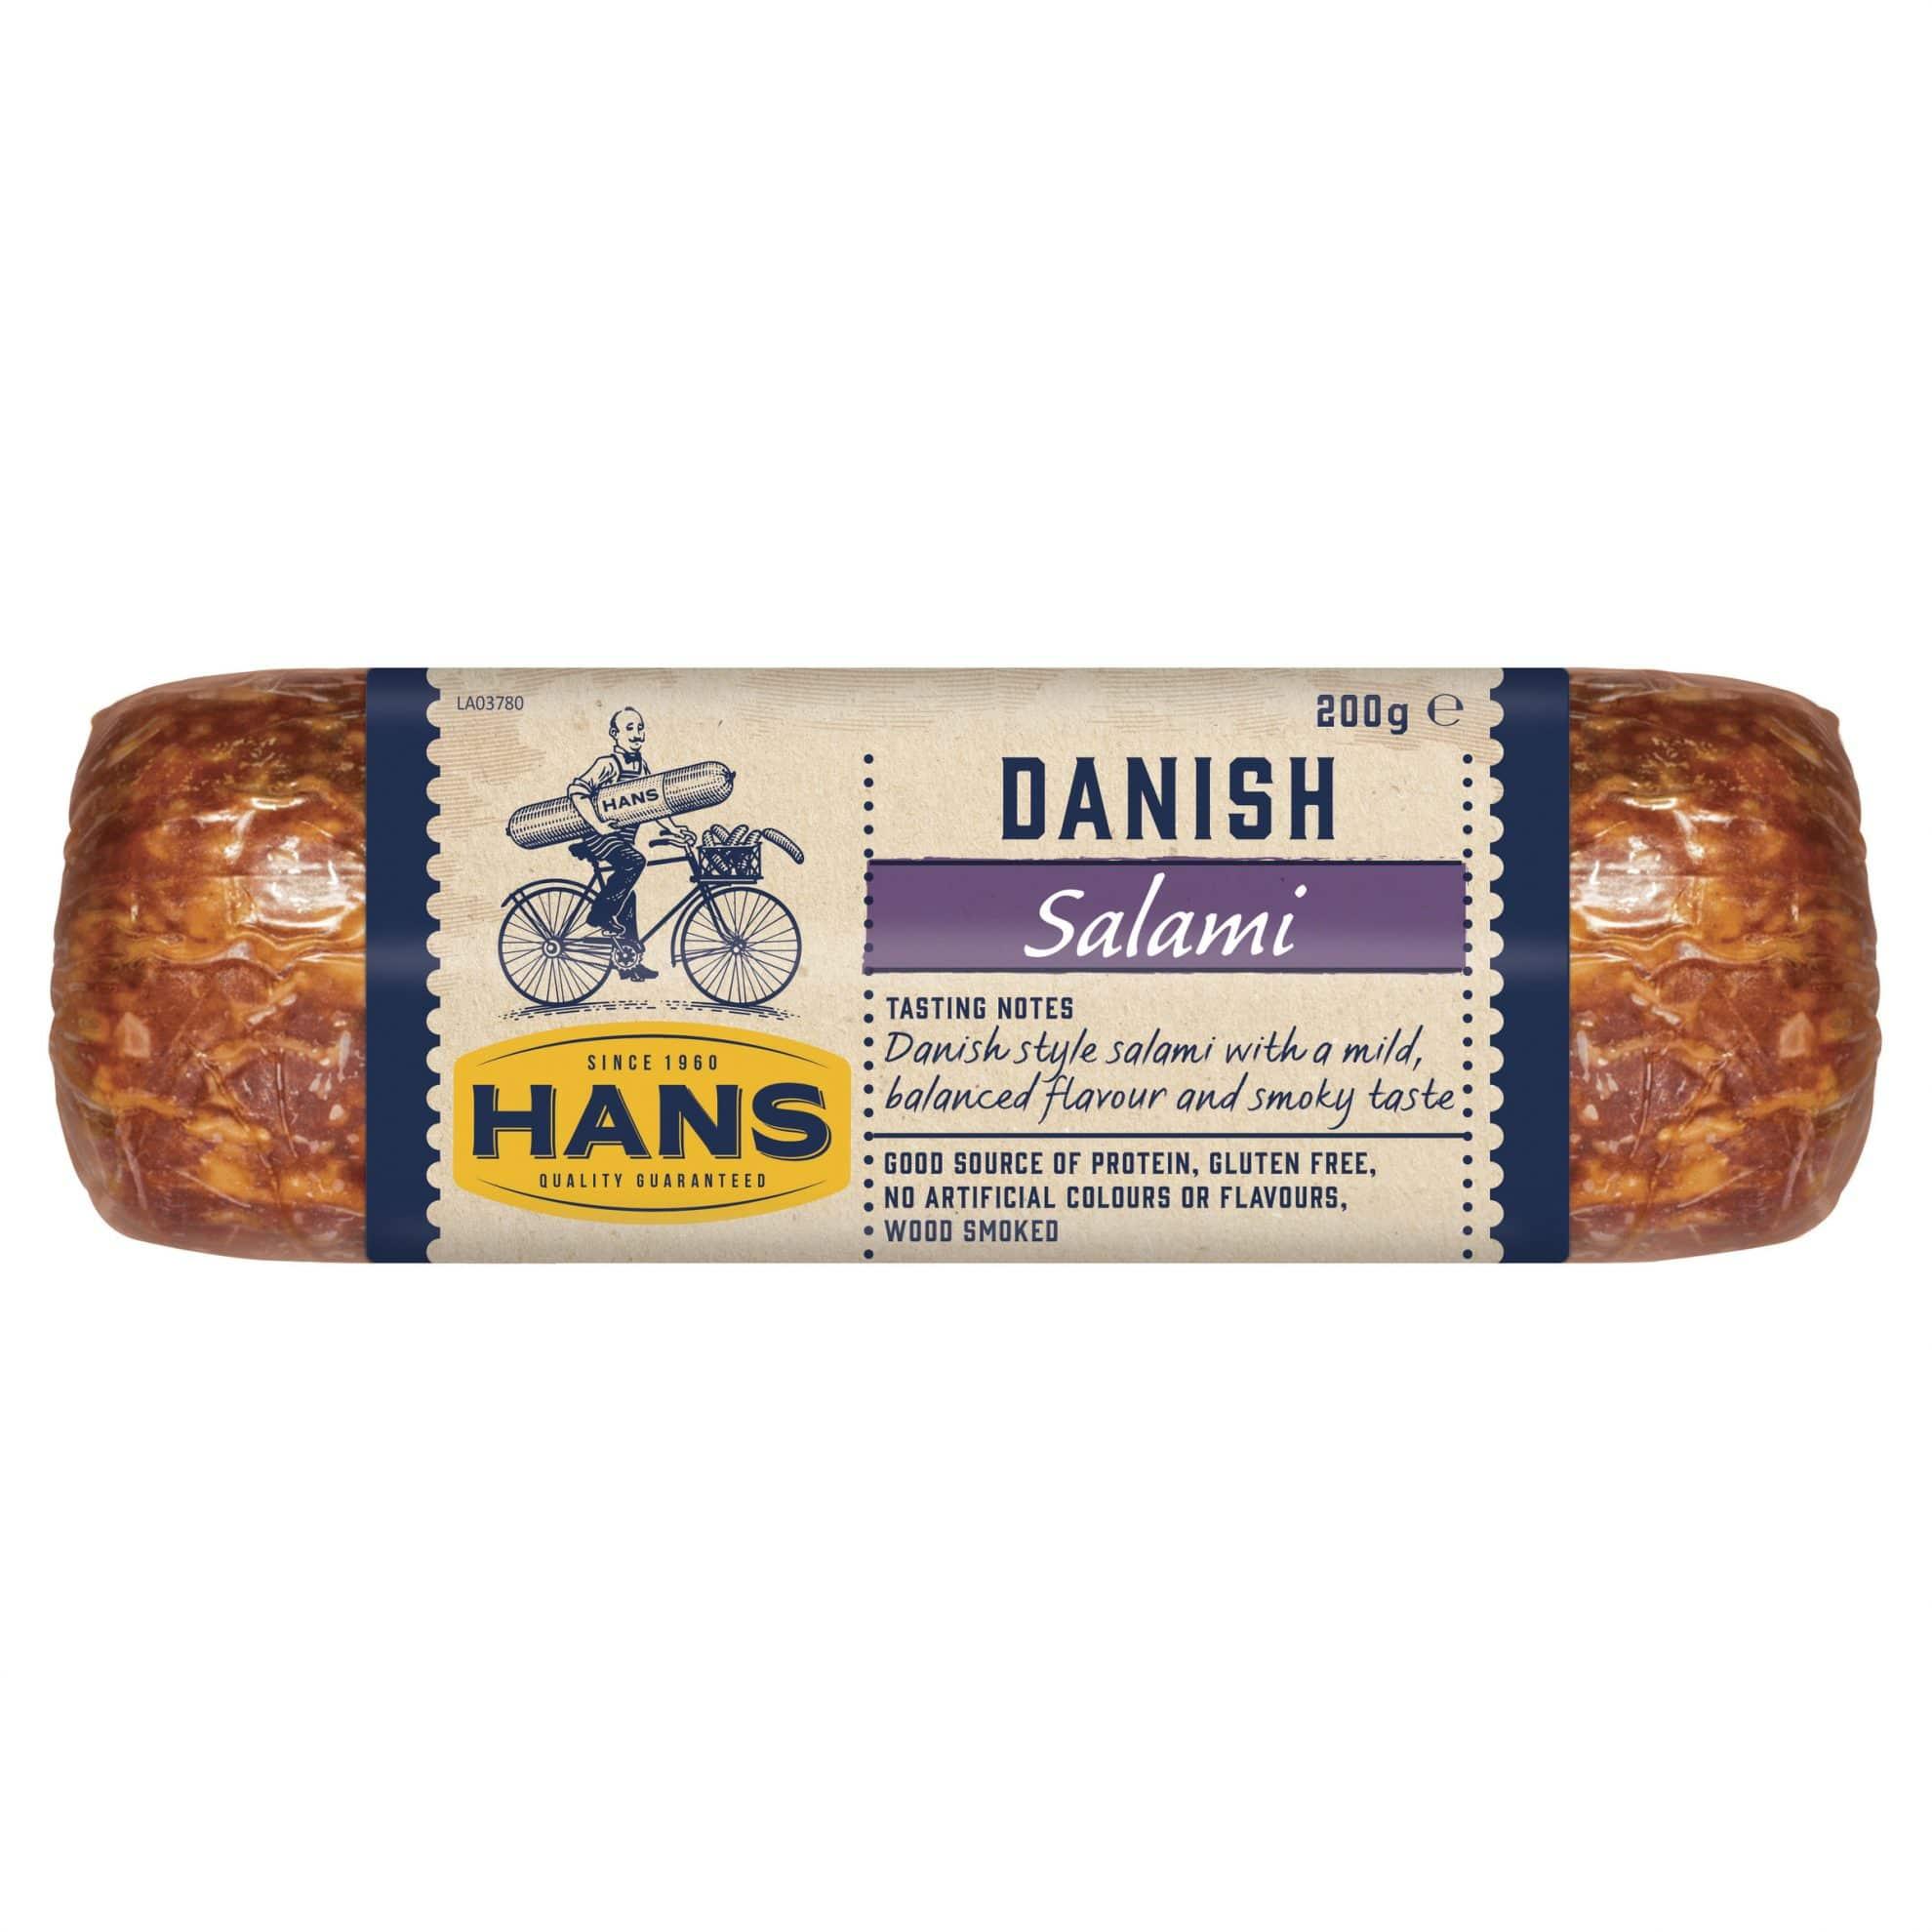 Hans Danish Salami 200g